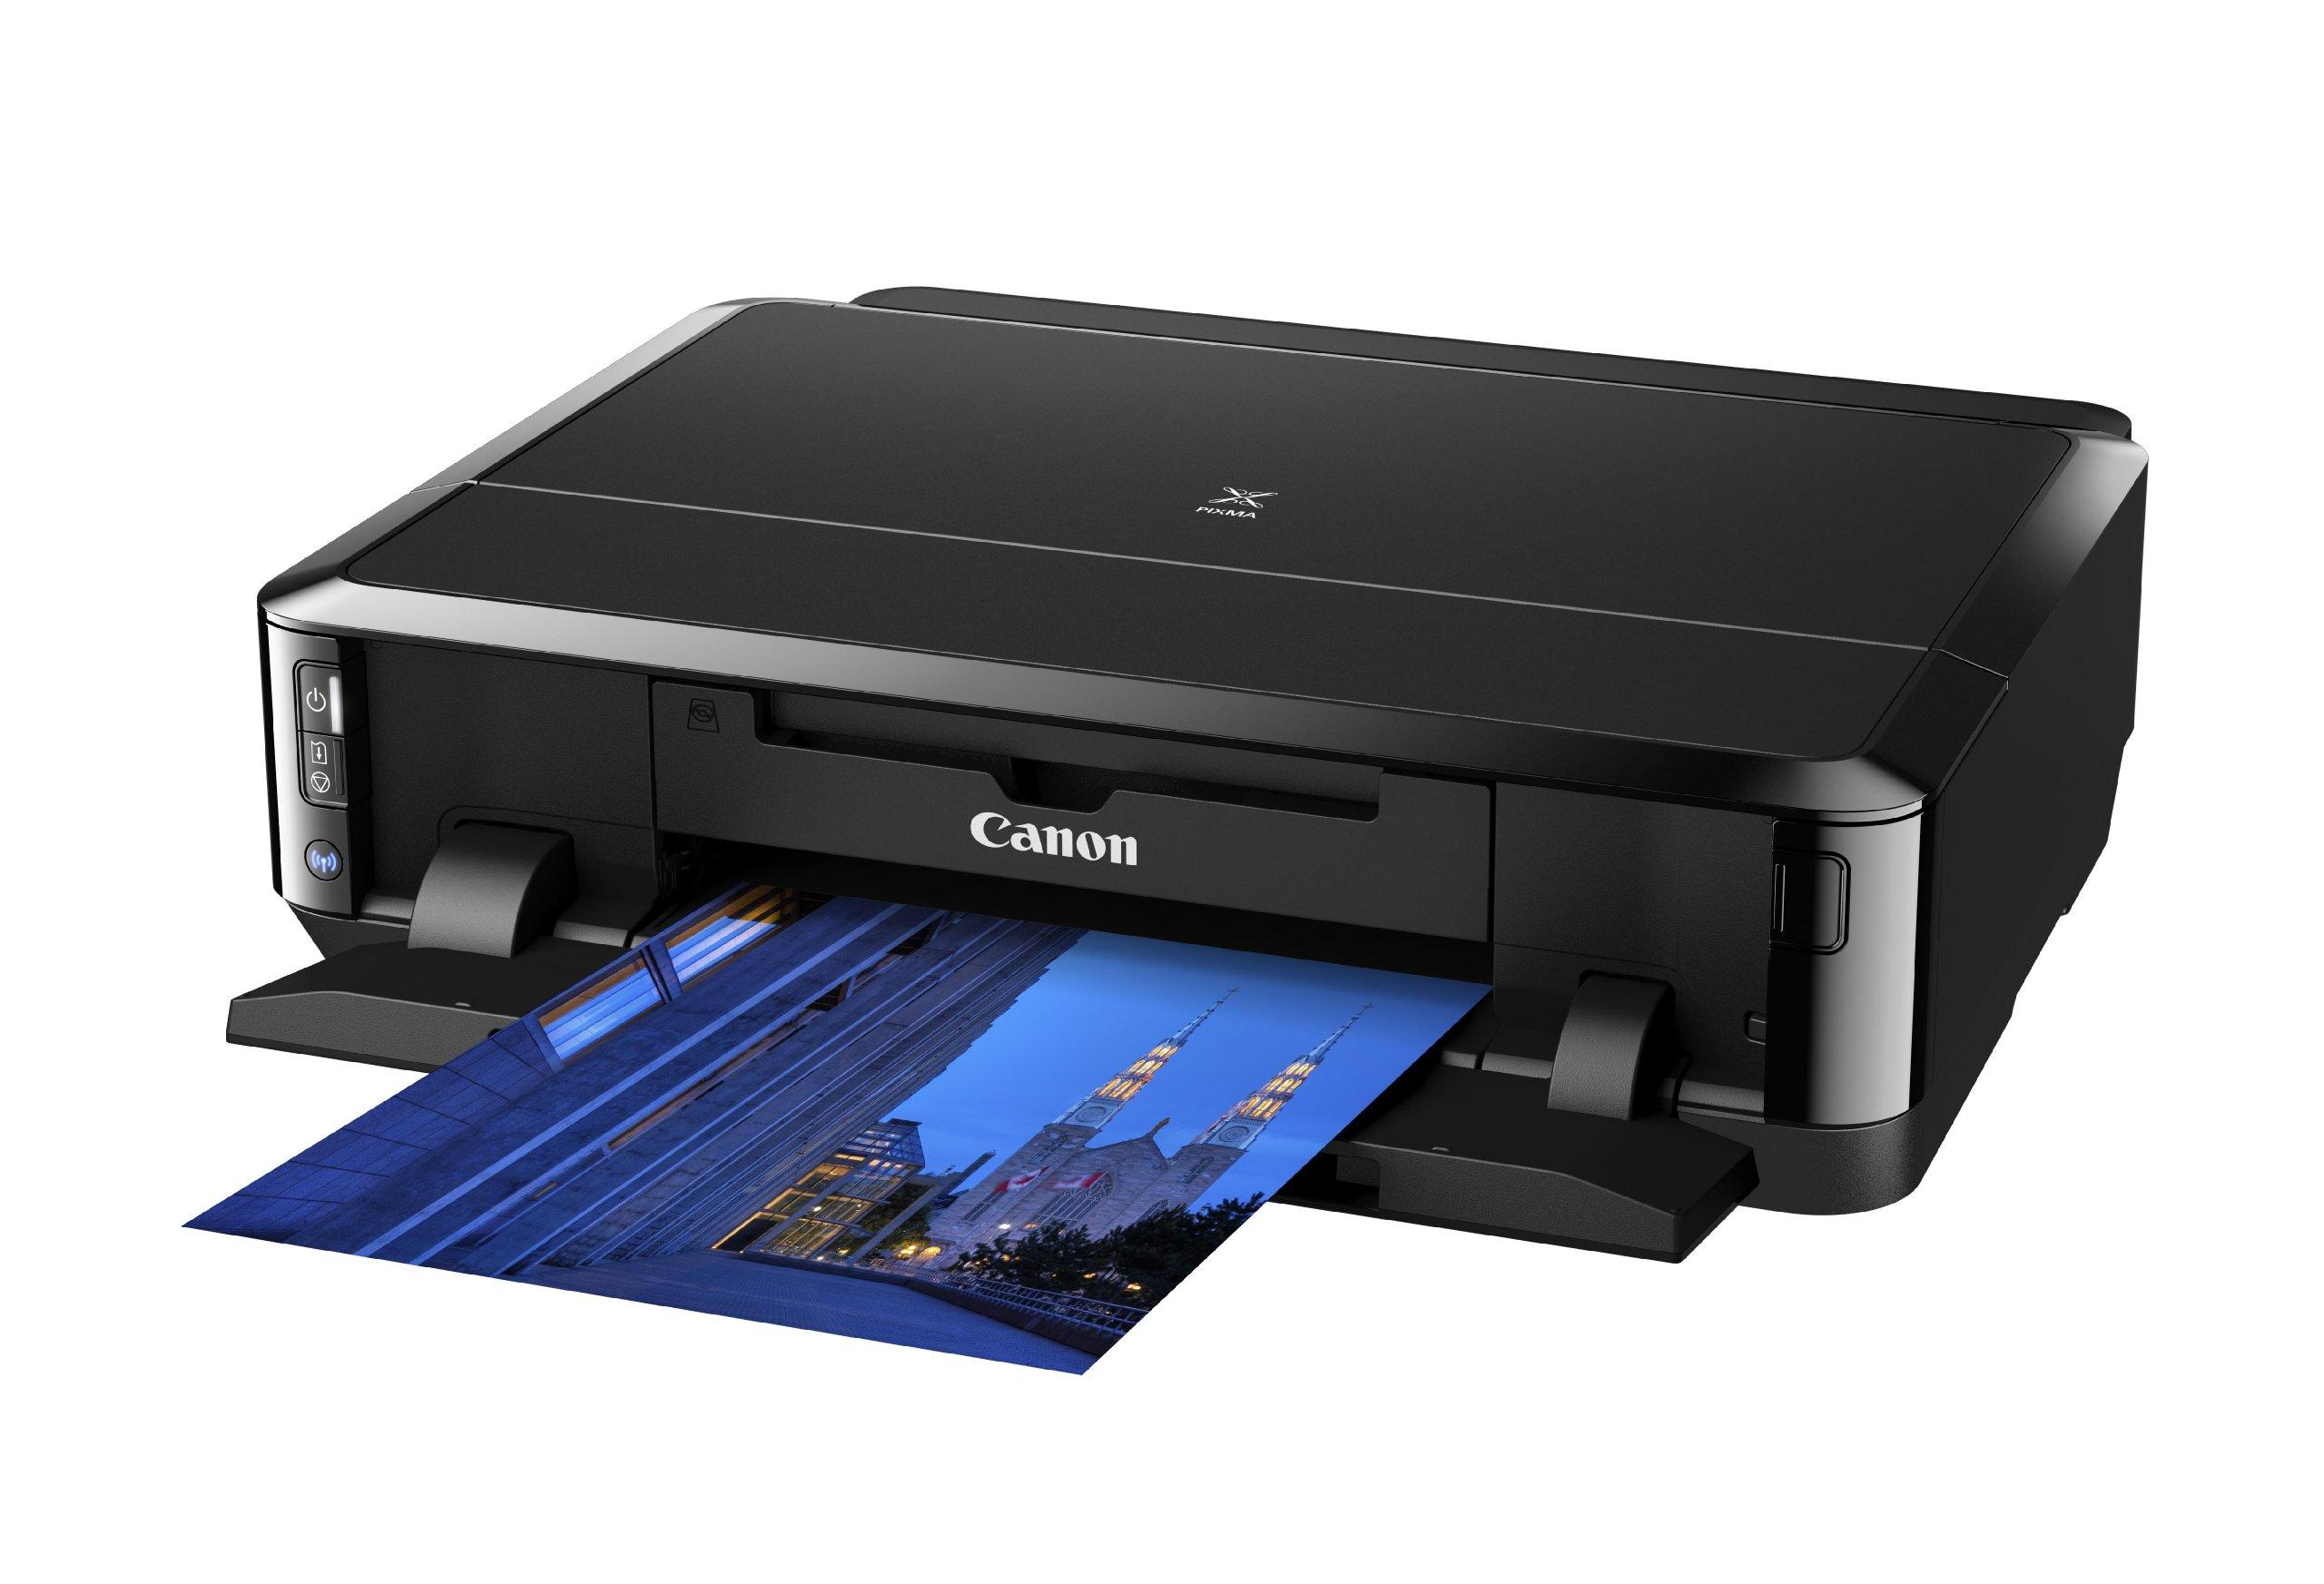 PIXMA iP7250 - Printer - colour - duplex - ink-jet